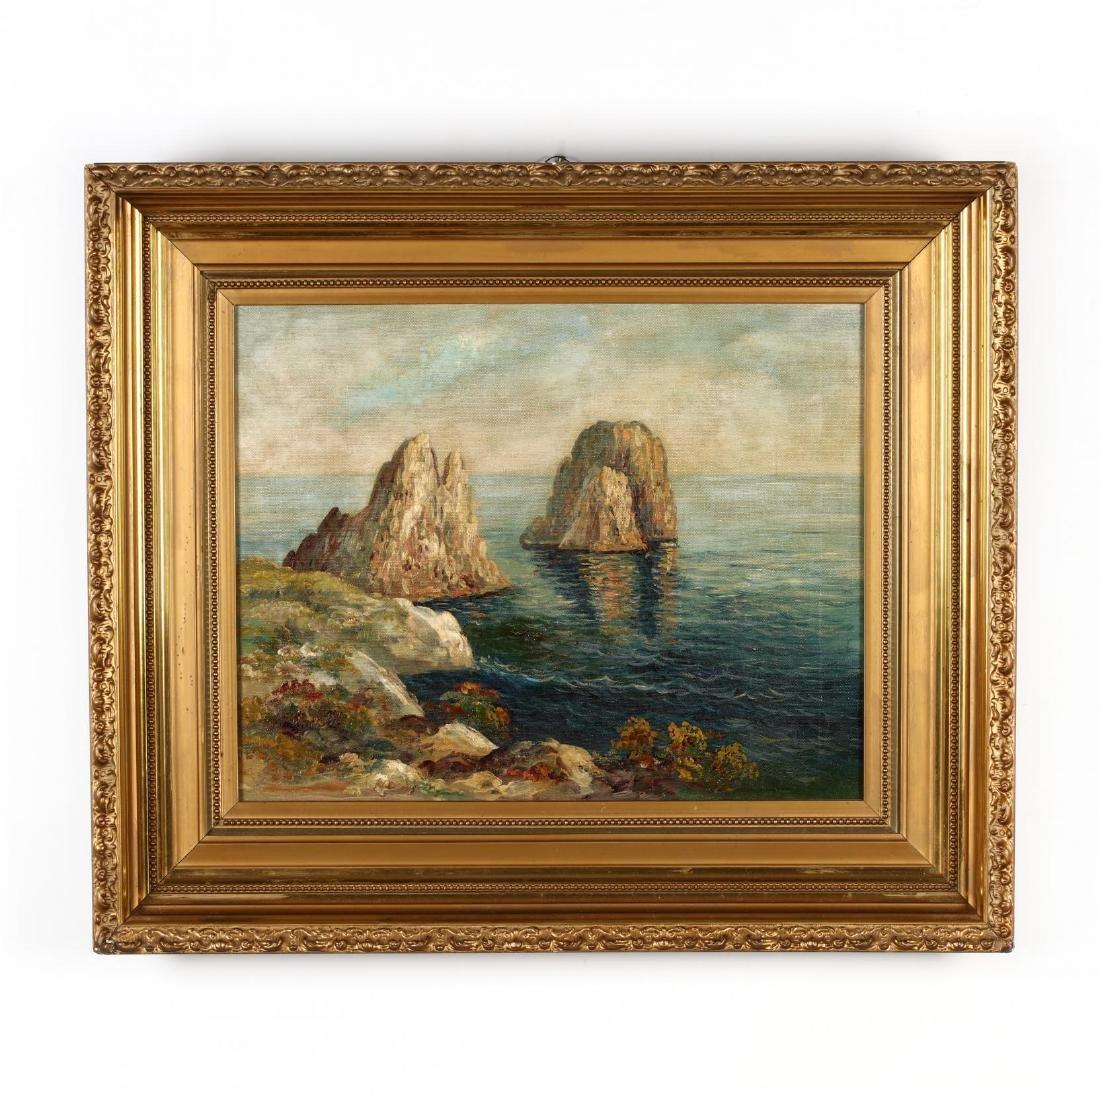 A Vintage Painting of a Mediterranean Coastline